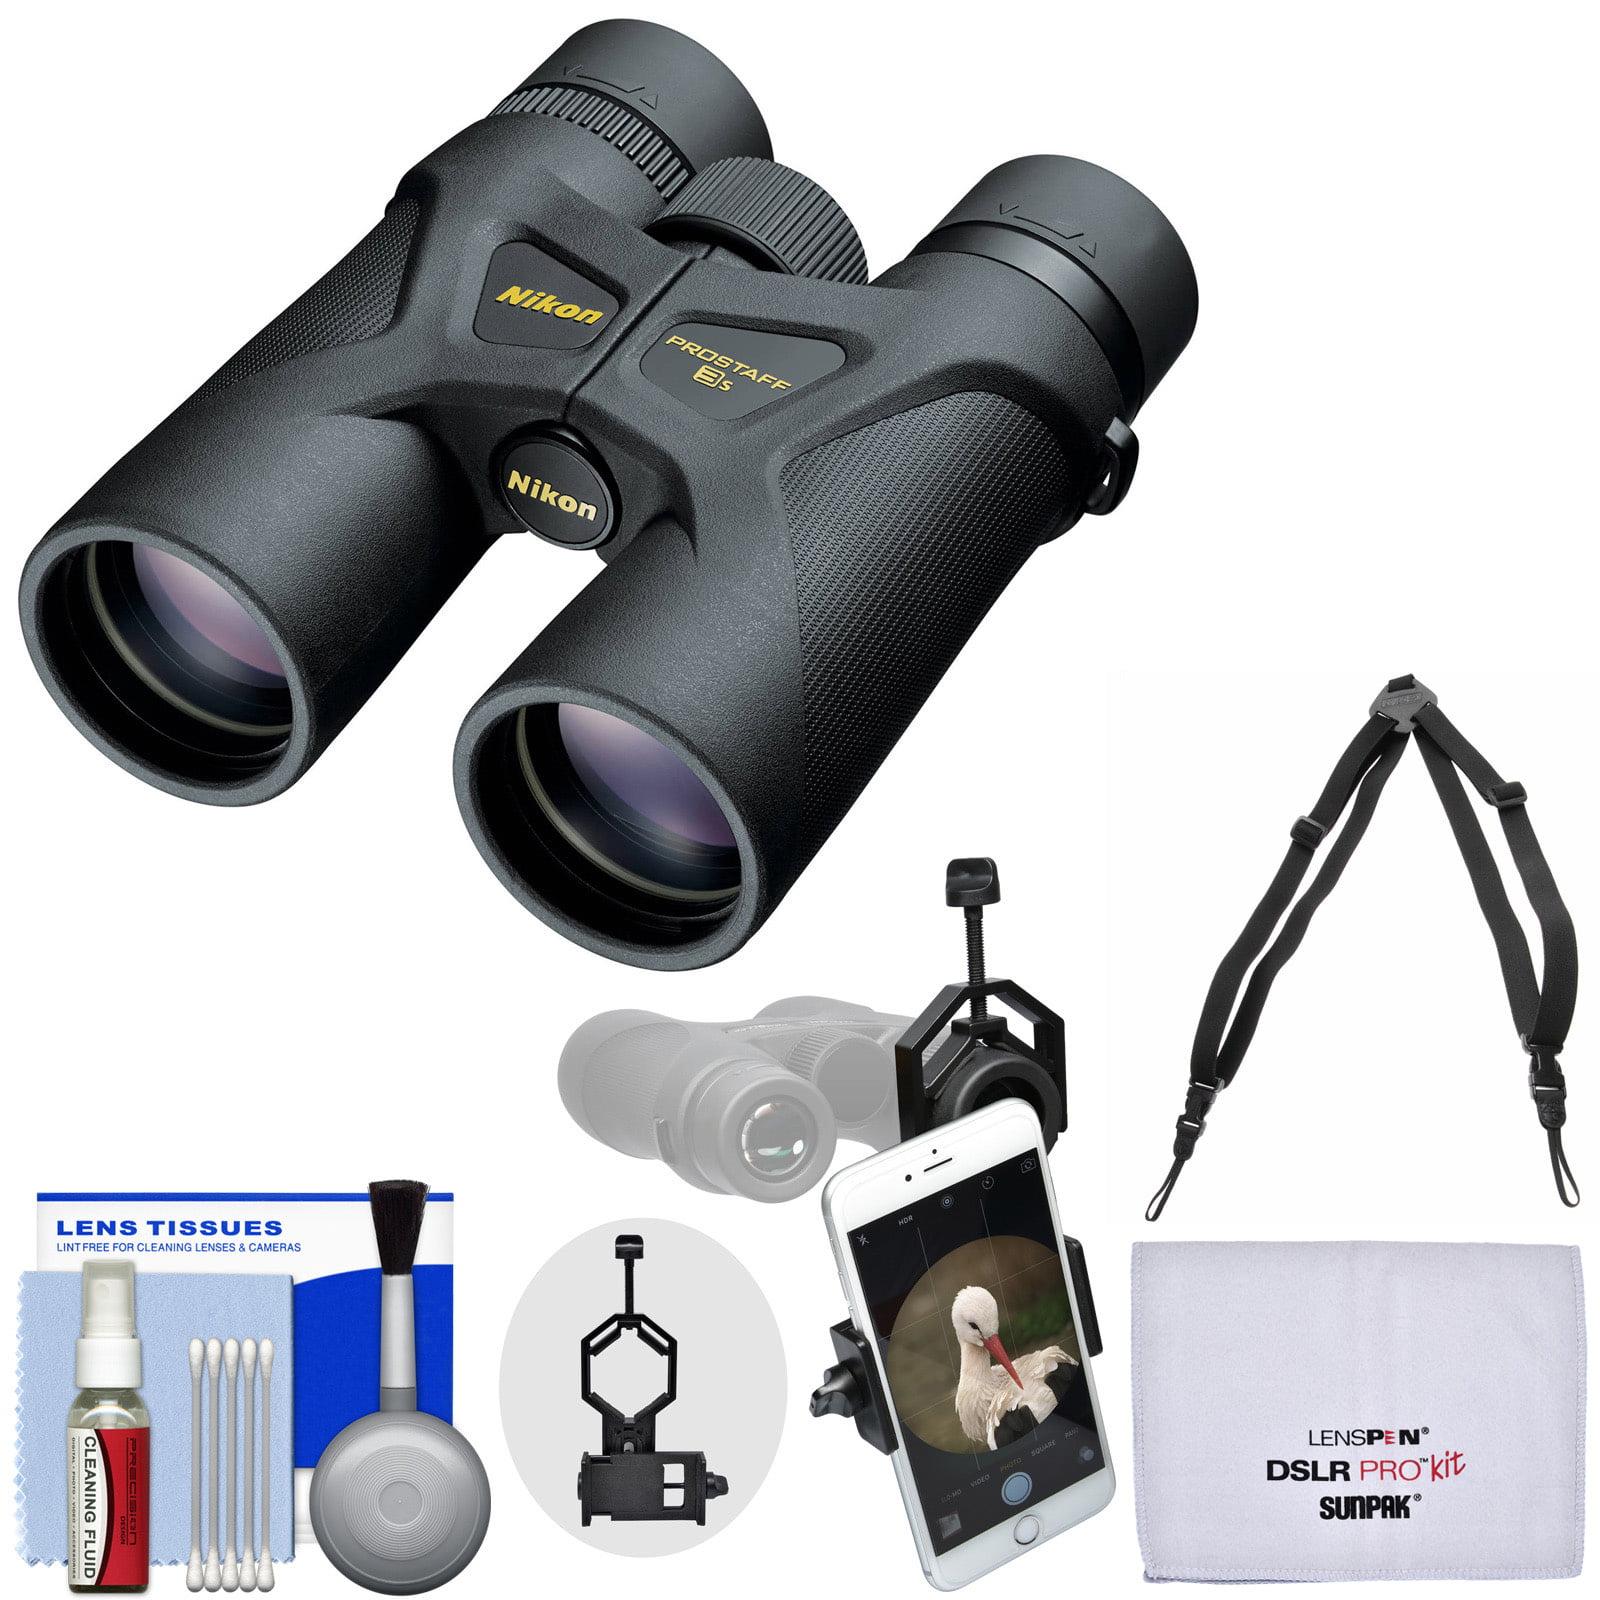 Nikon Prostaff 3S 10x42 Waterproof / Fogproof Binoculars with Case + Harness + Smartphone Adapter + Cleaning Kit